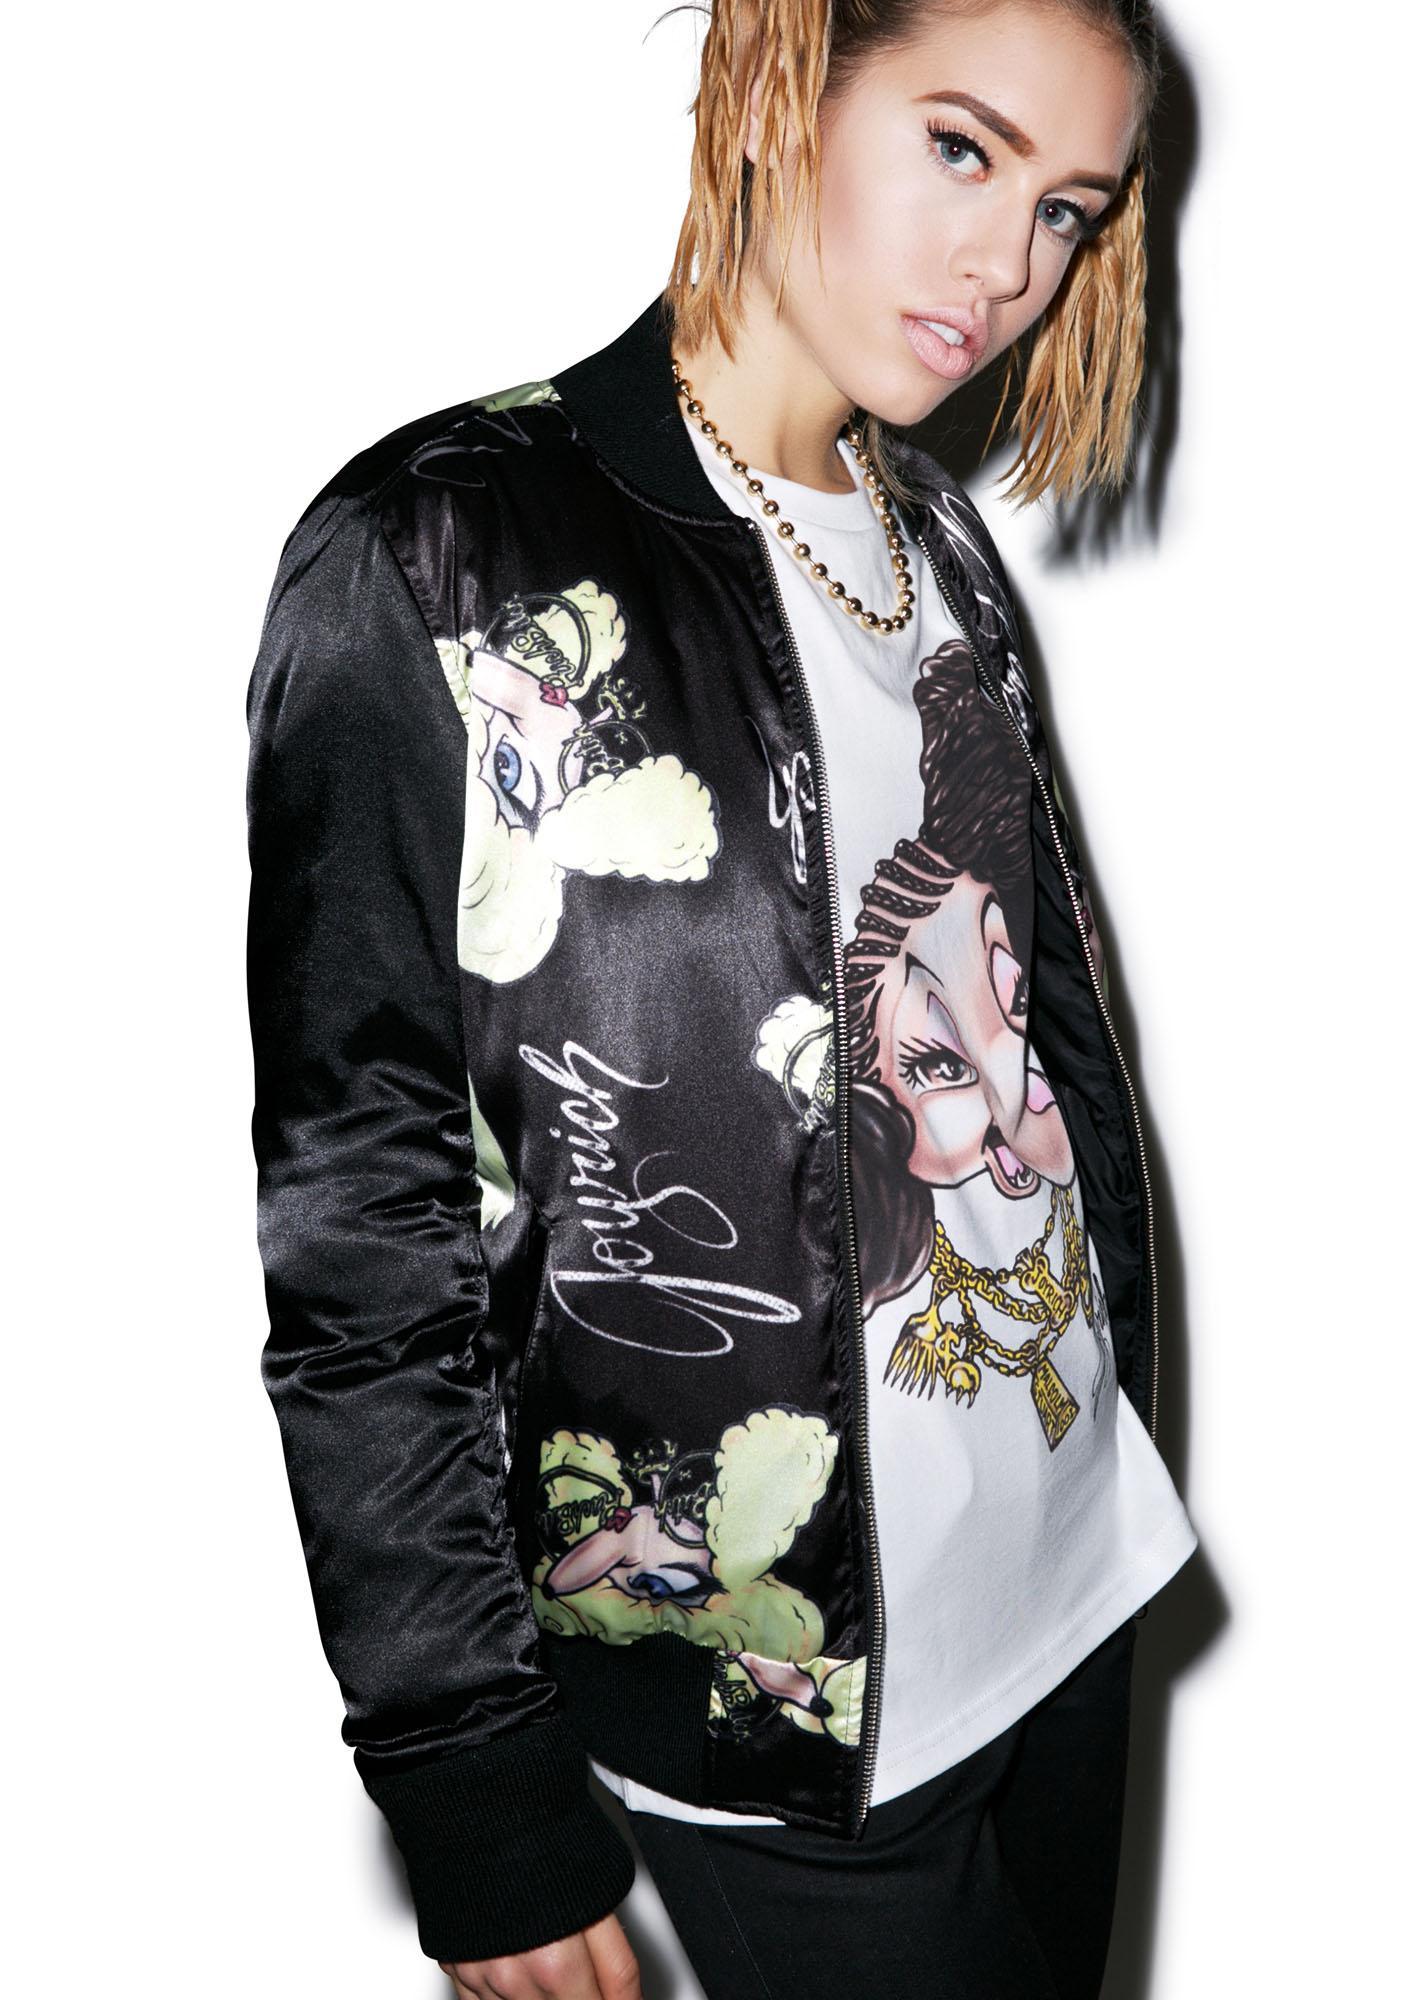 Joyrich Rich Bitch Reversible Jacket